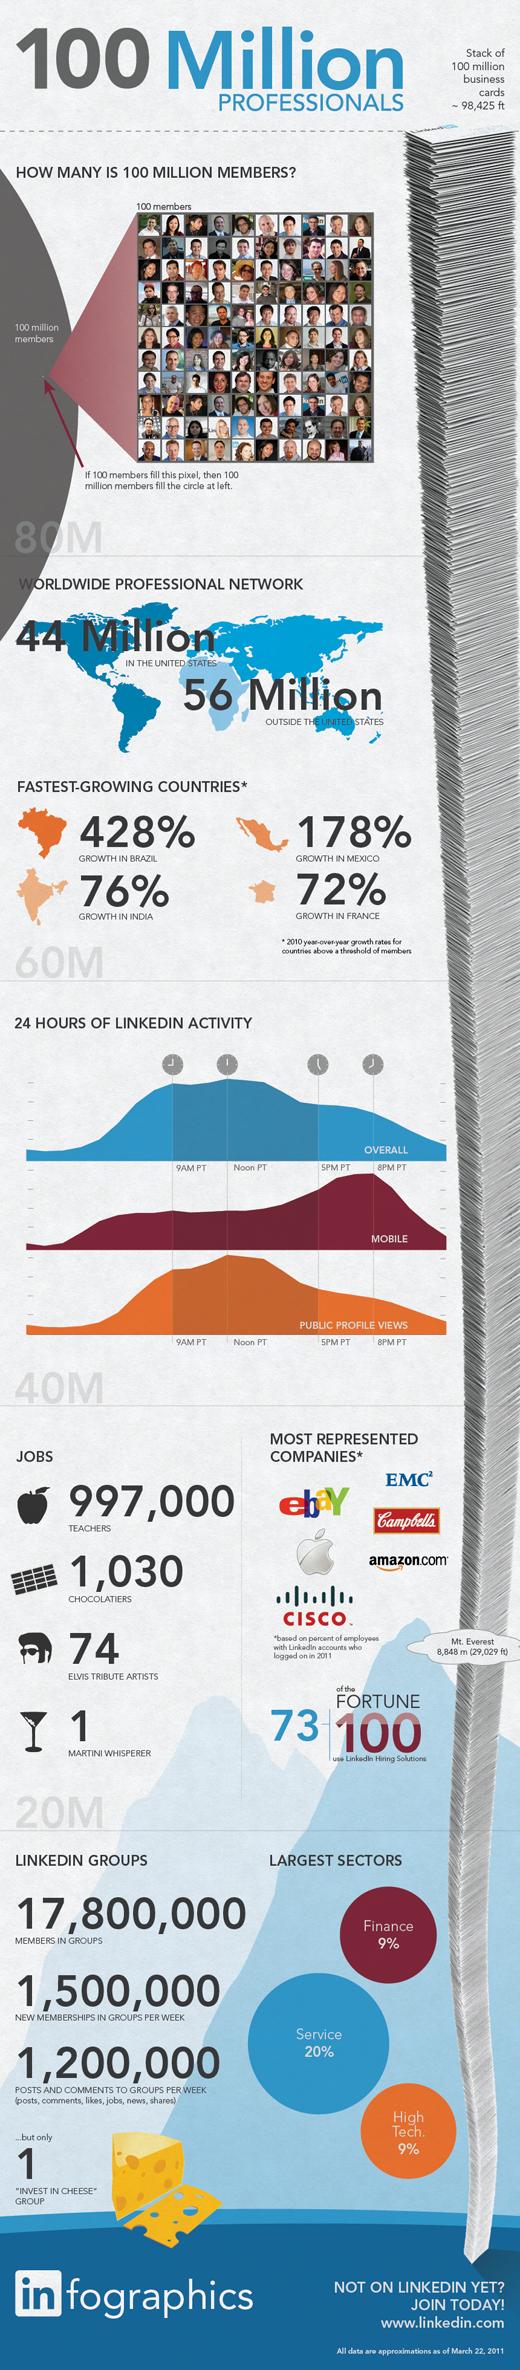 linkedin infographic resized 600